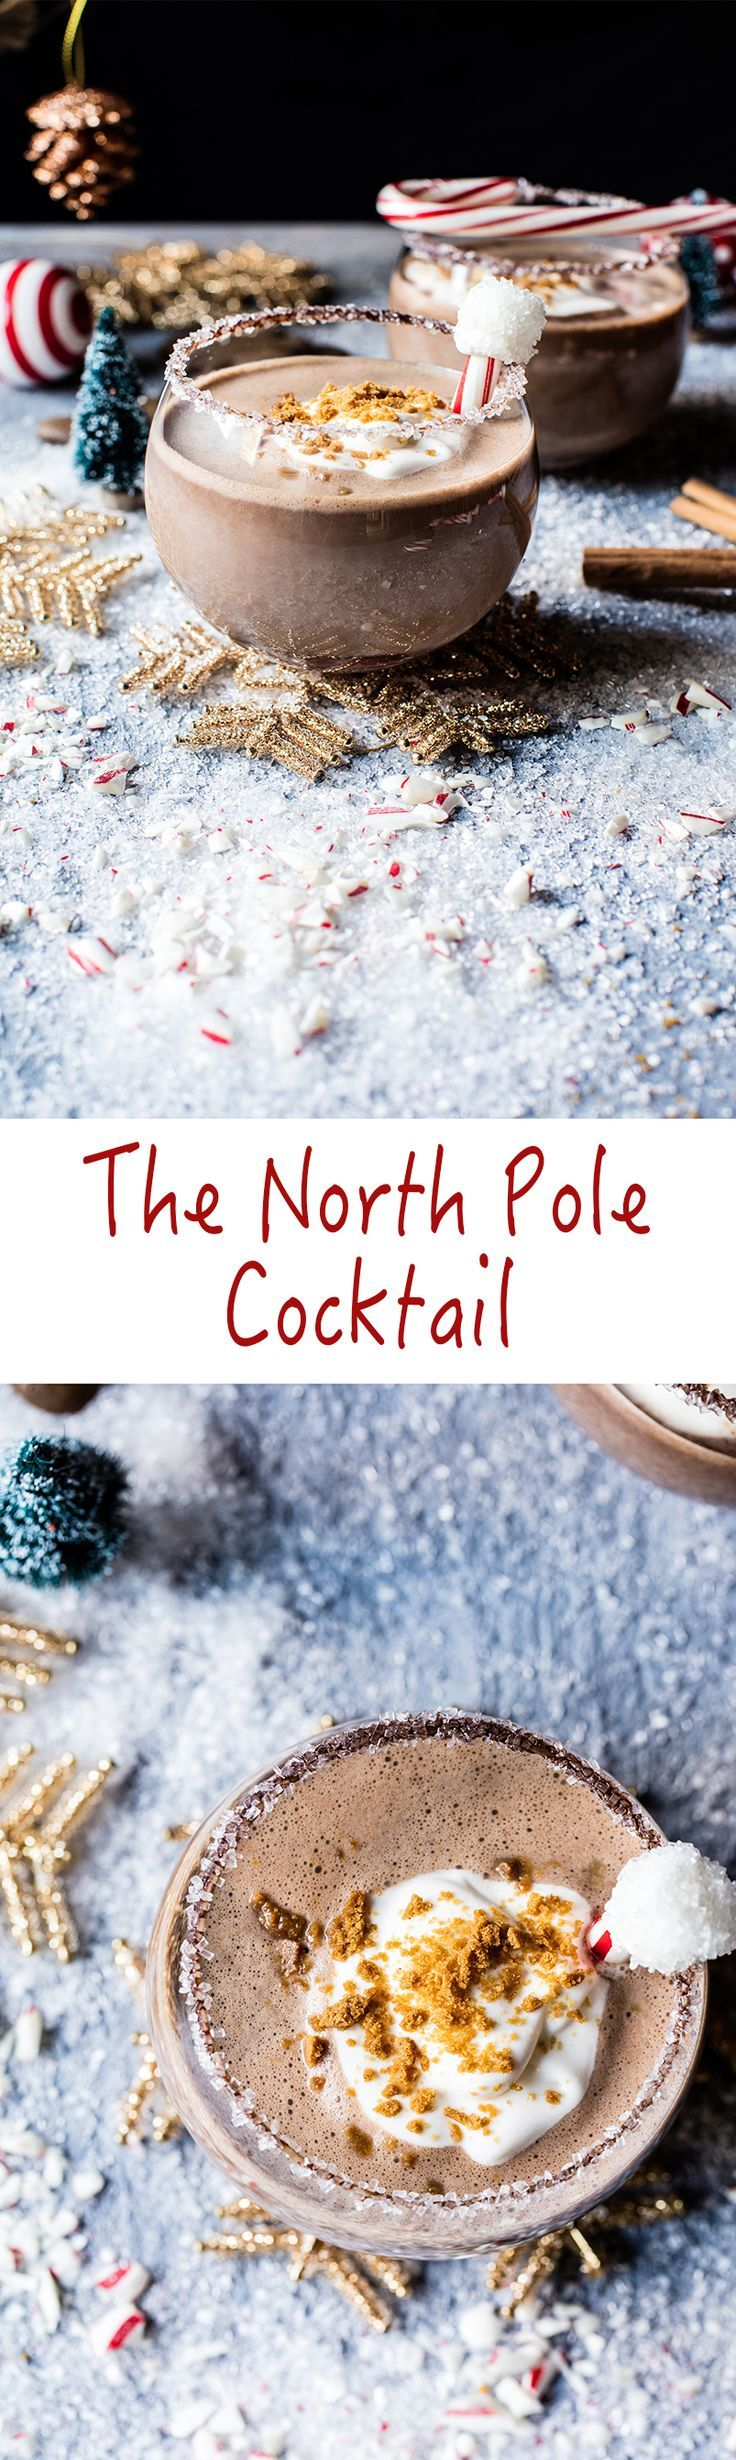 The North Pole Cocktail | halfbakedharvest.com @hbharvest